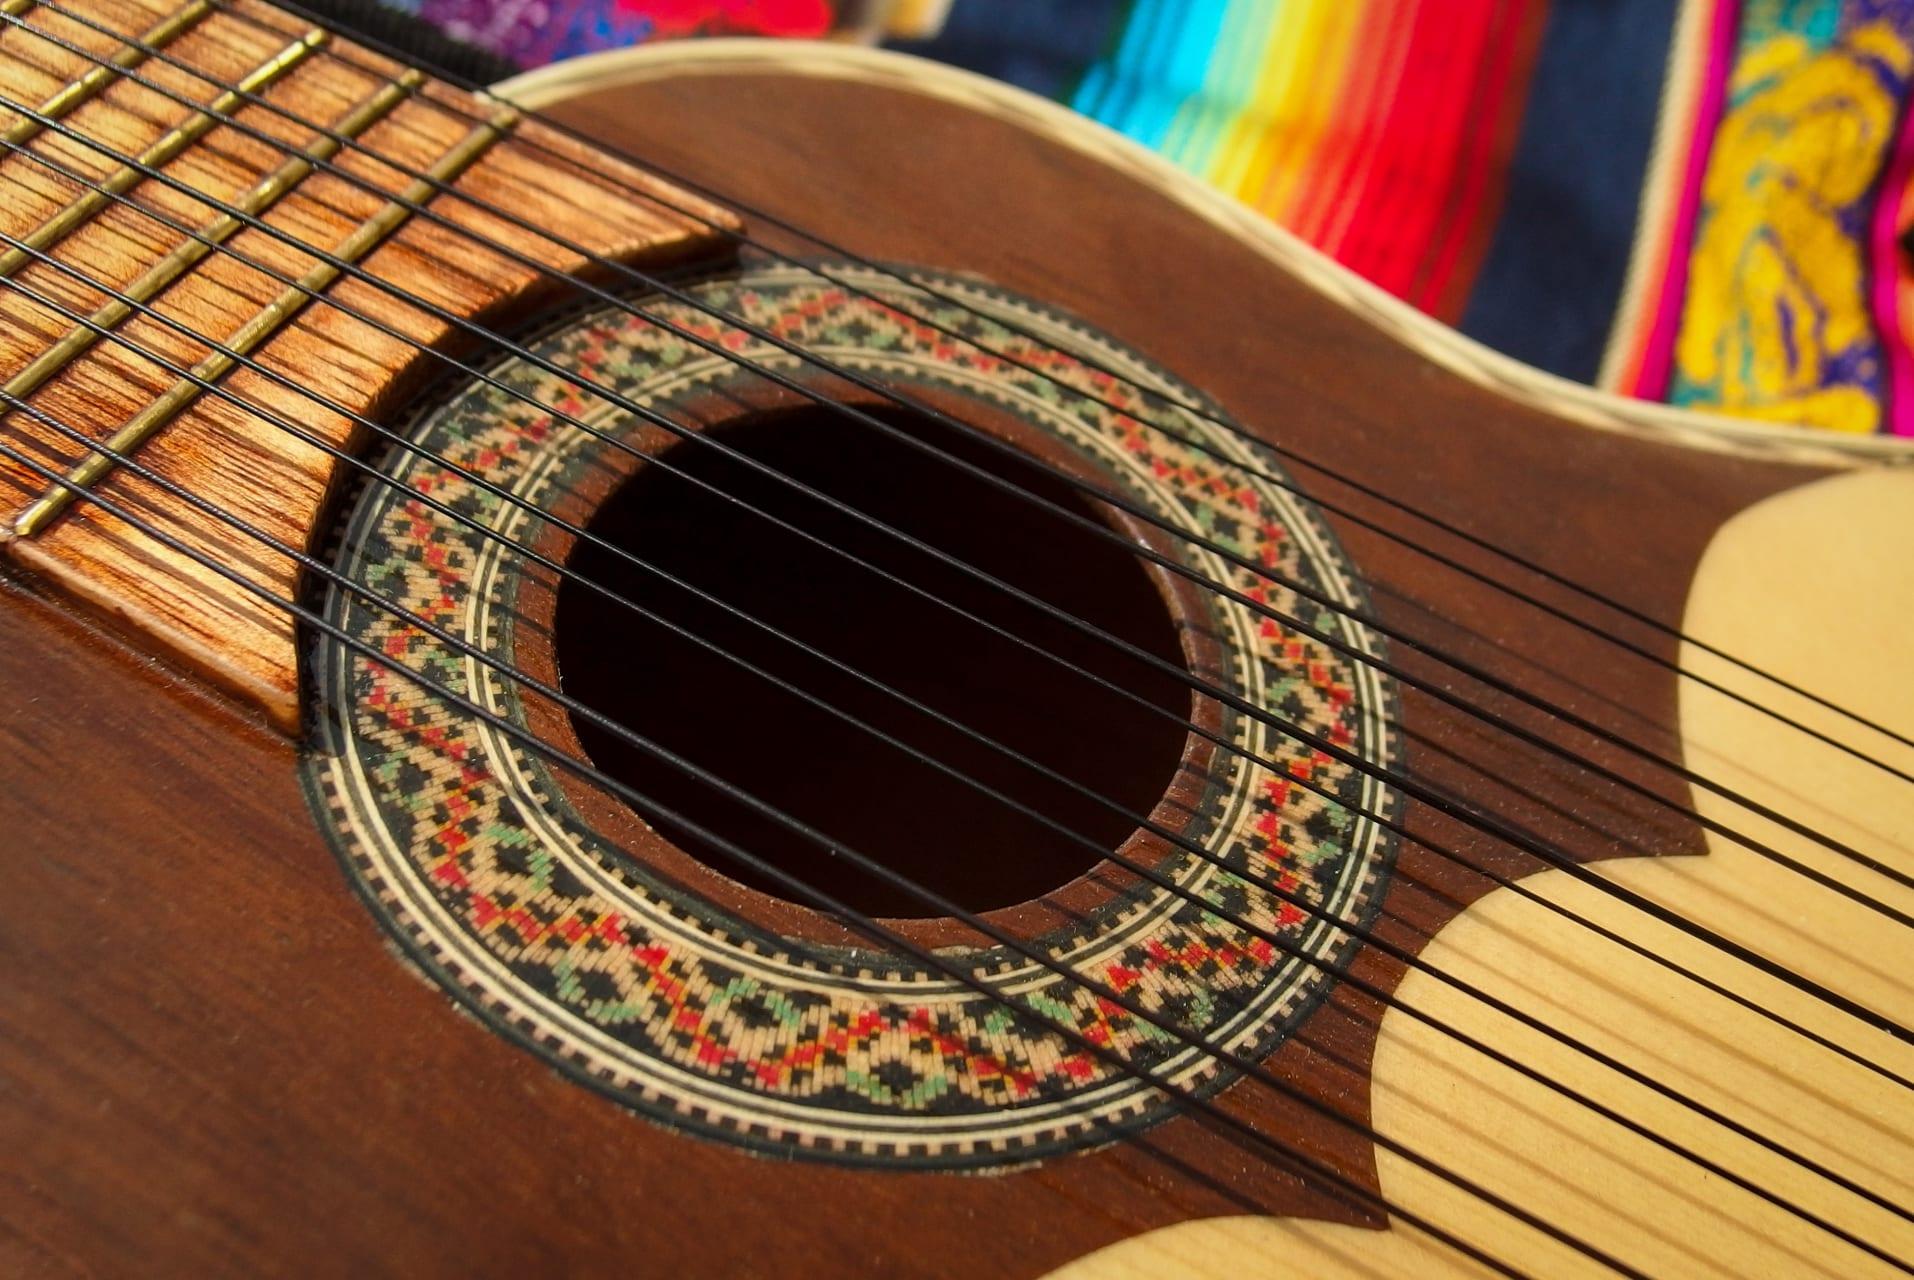 Arequipa - Halloween and Peruvian Criolla Music Celebrations!